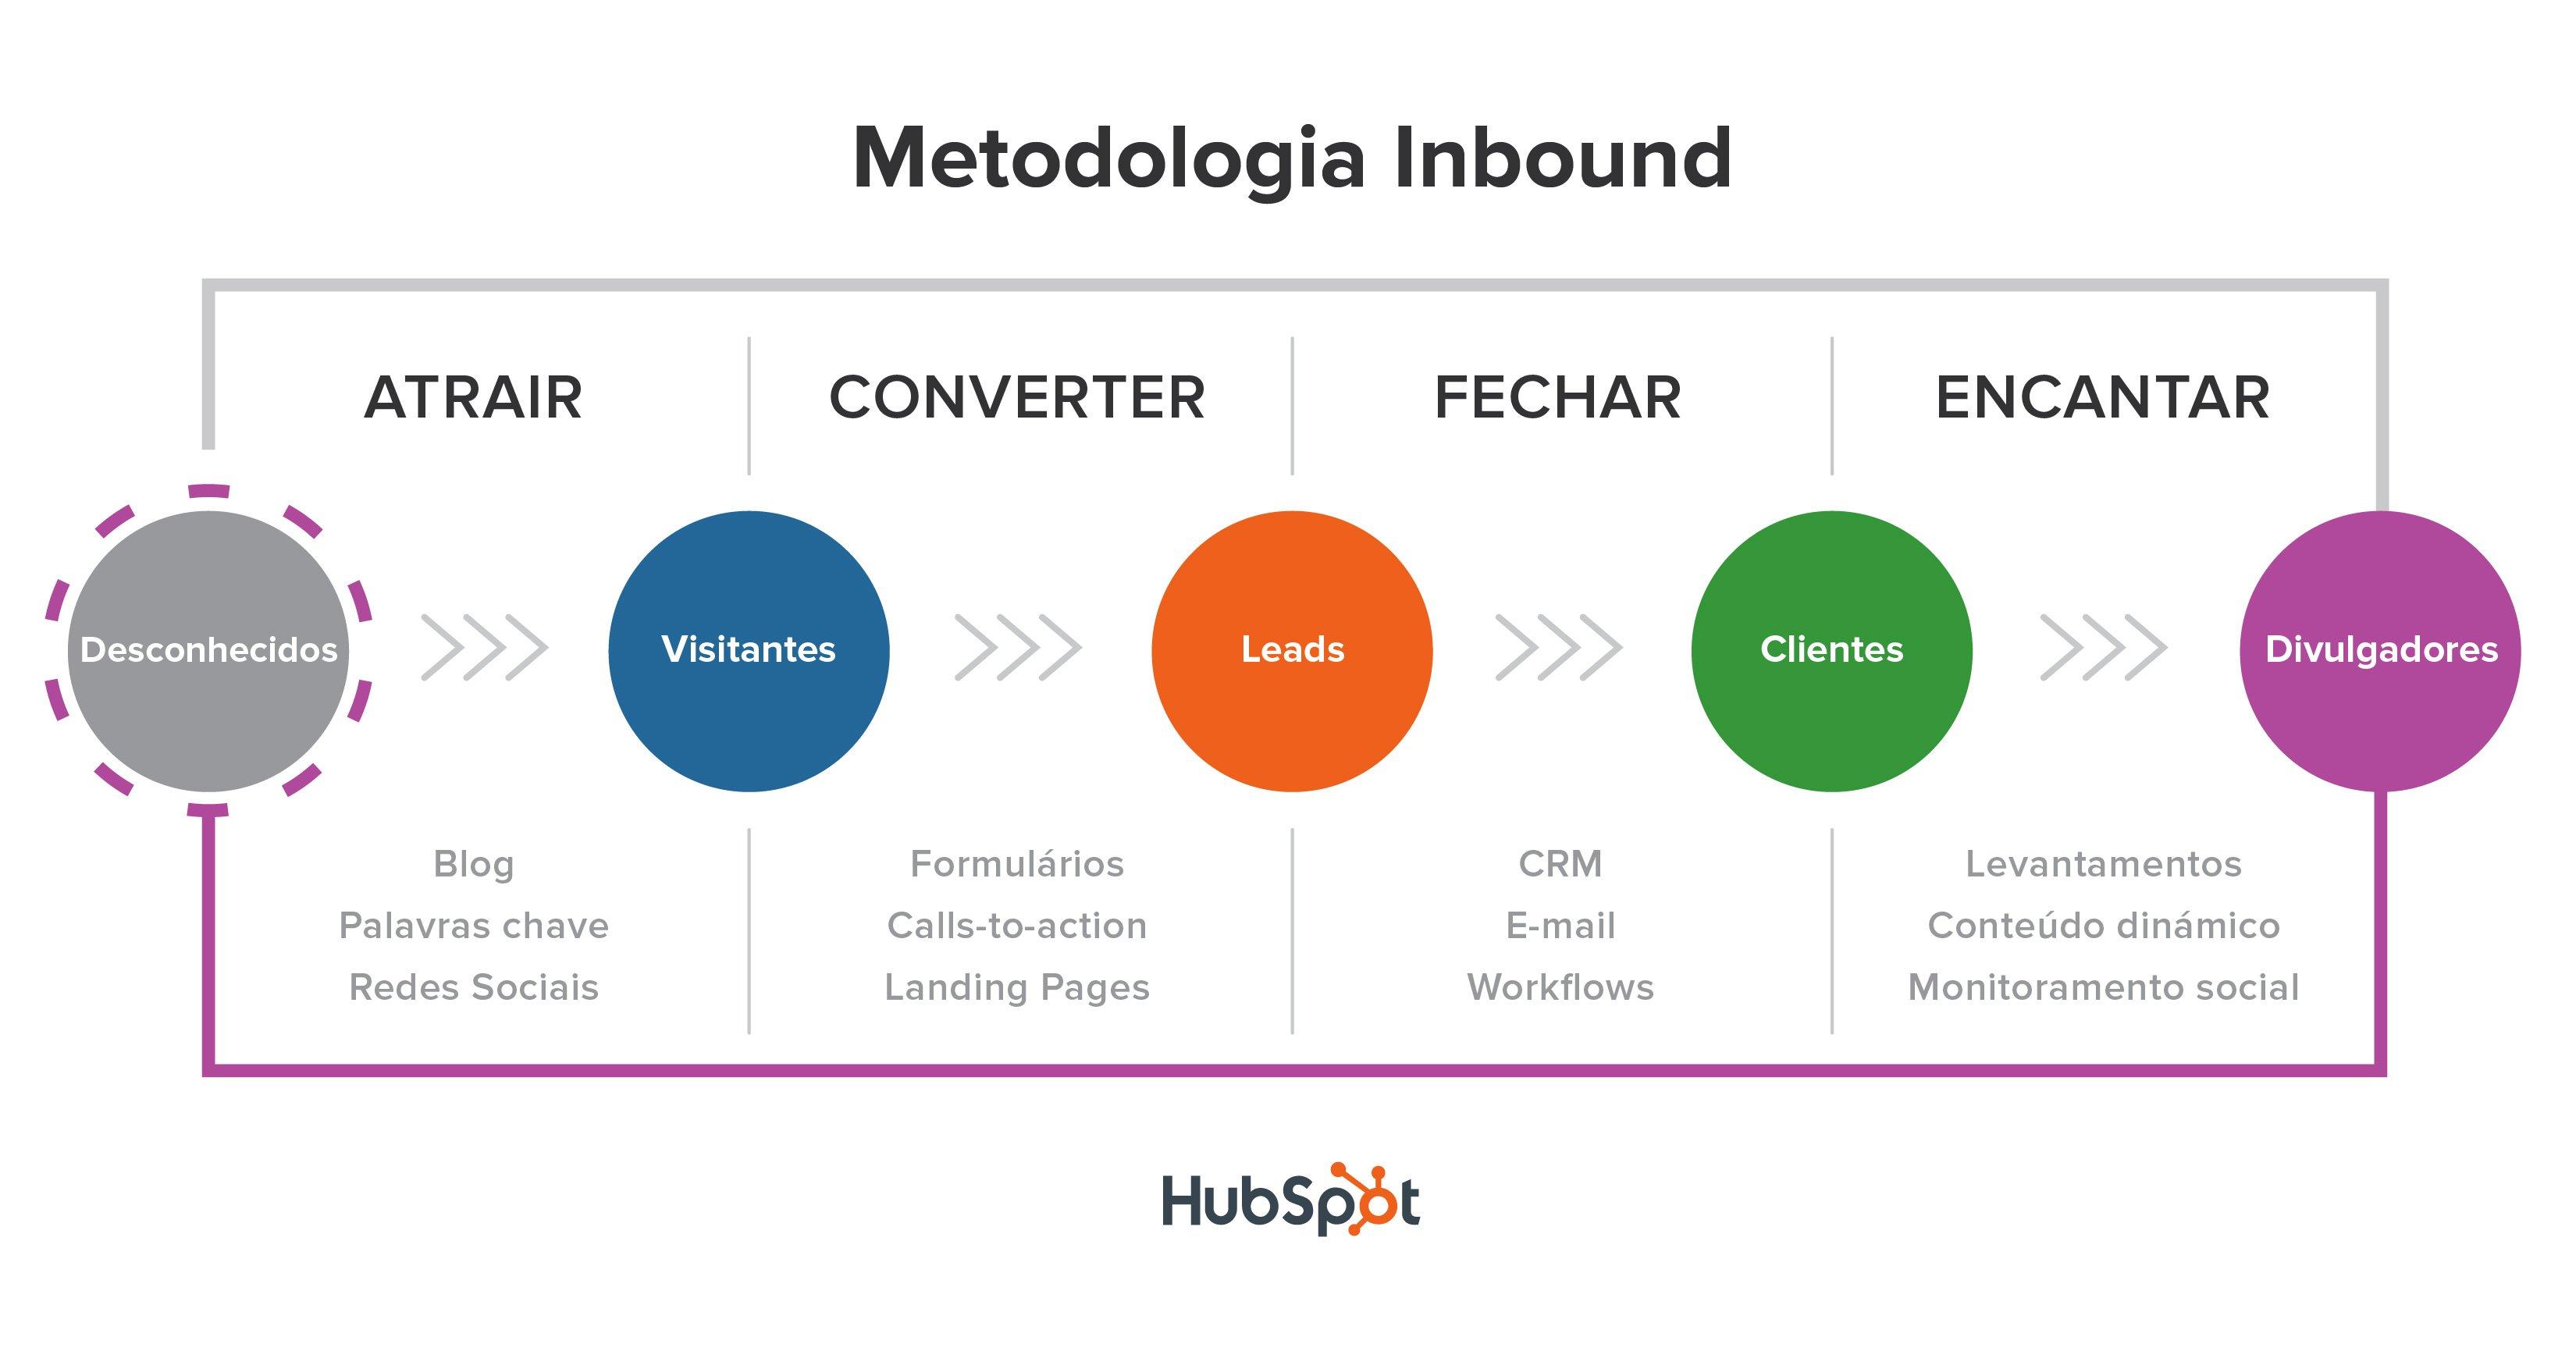 metodologia-inbound-hubspot